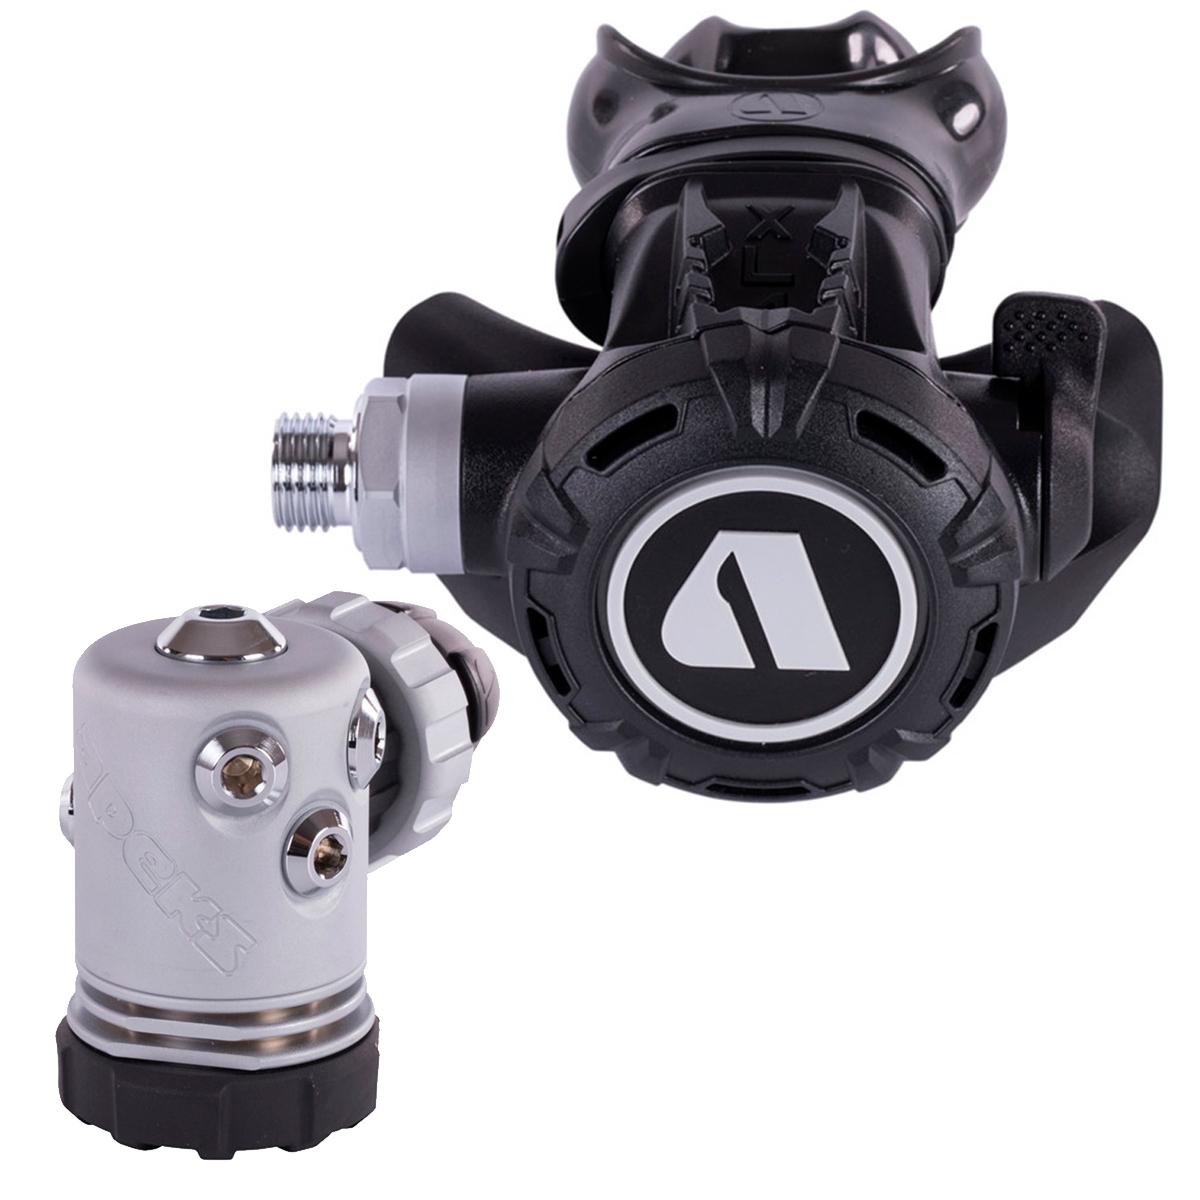 APEKS - XL4 Atemregler DIN 2stufig